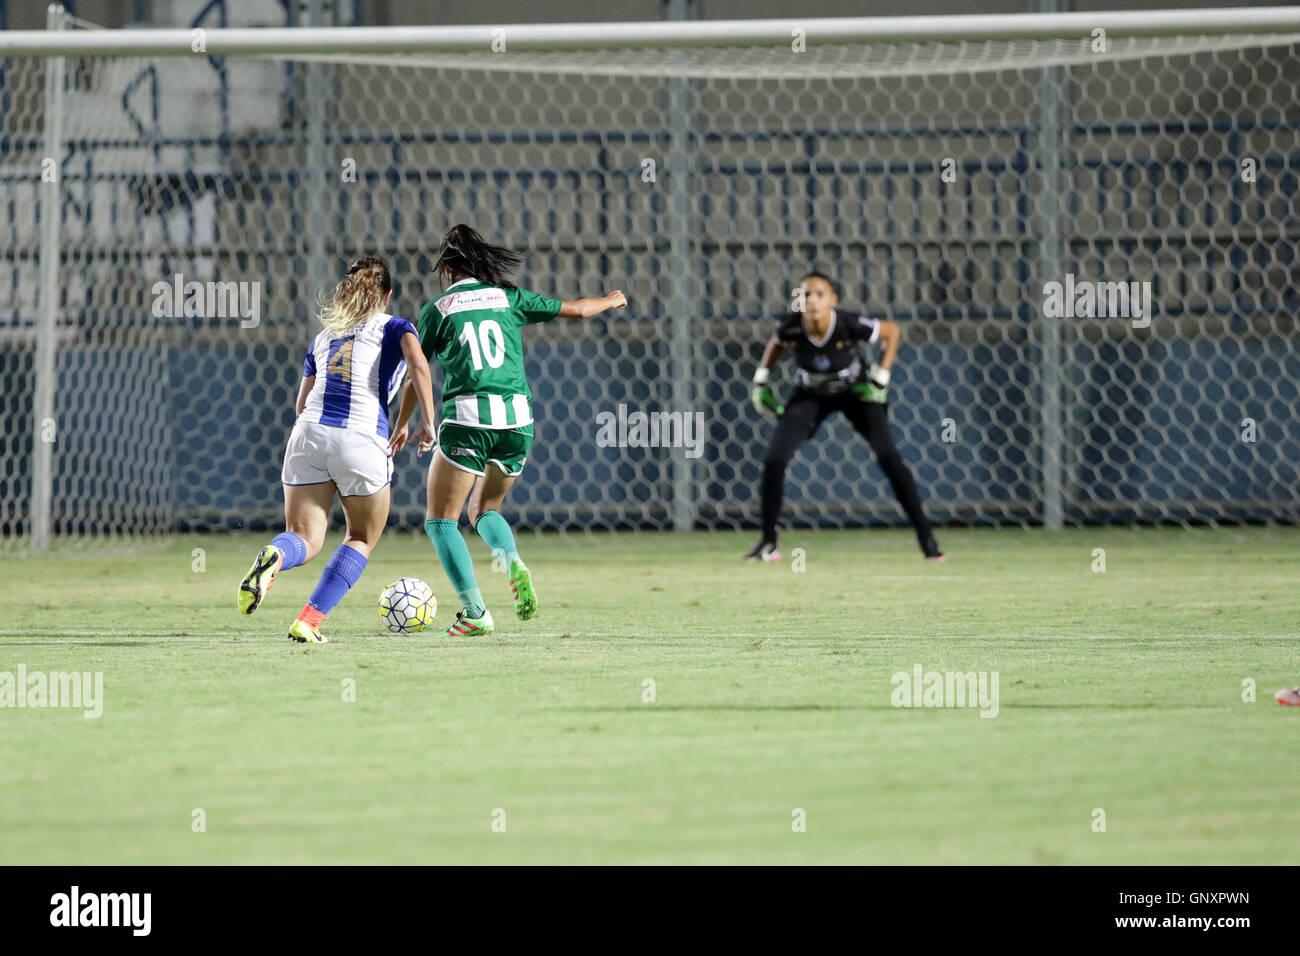 MANAUS, AM - 31.08.2016: IRANDUBA AM X SÃO RAIMUNDO RR - Mariana drives the ball to attack during match between - Stock Image